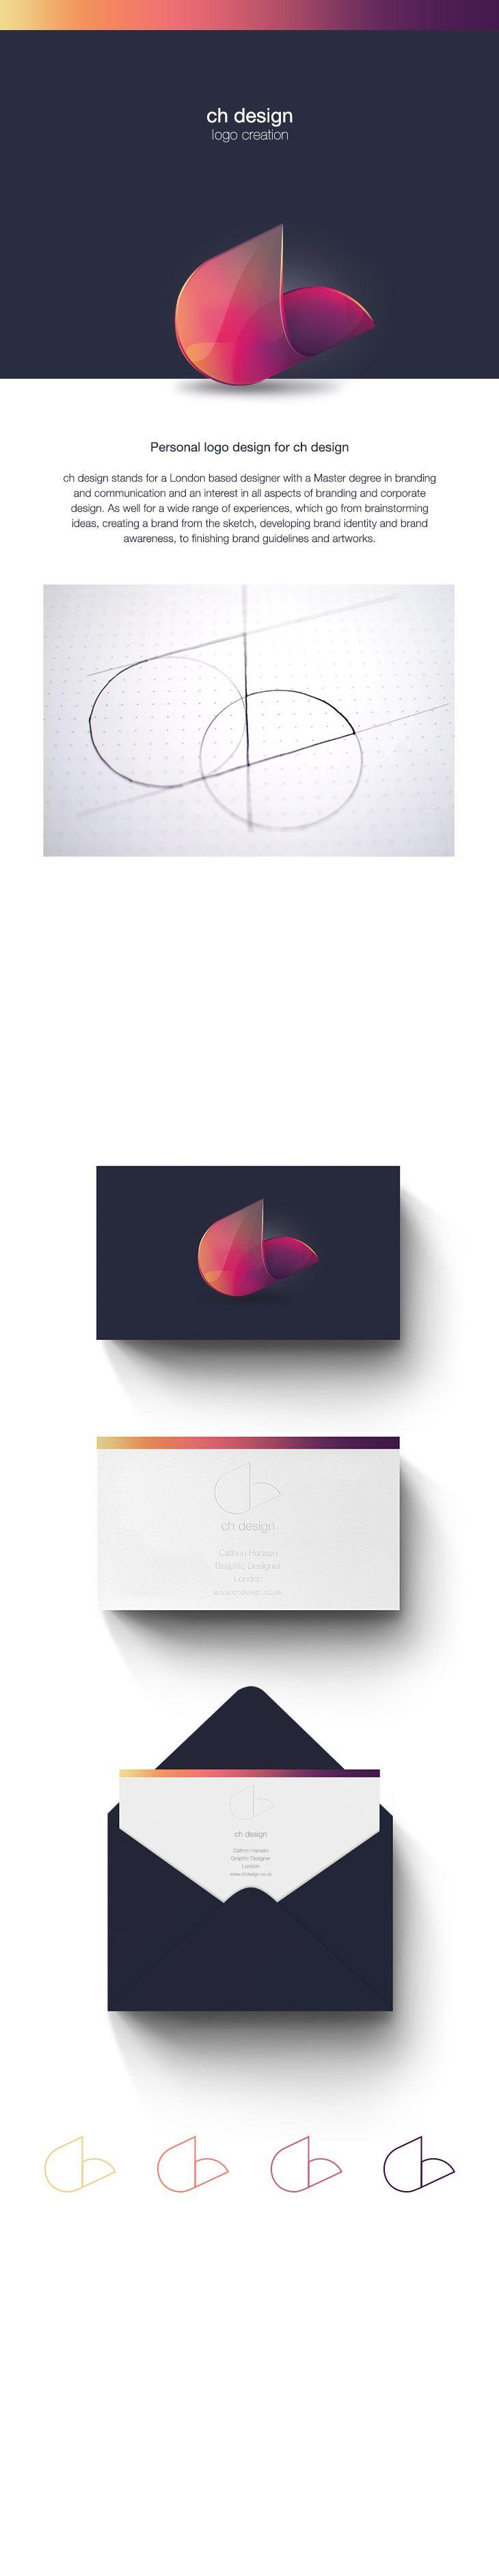 Personal logo design Branding, Graphic Design http://www.behance.net/Cathrinhansen